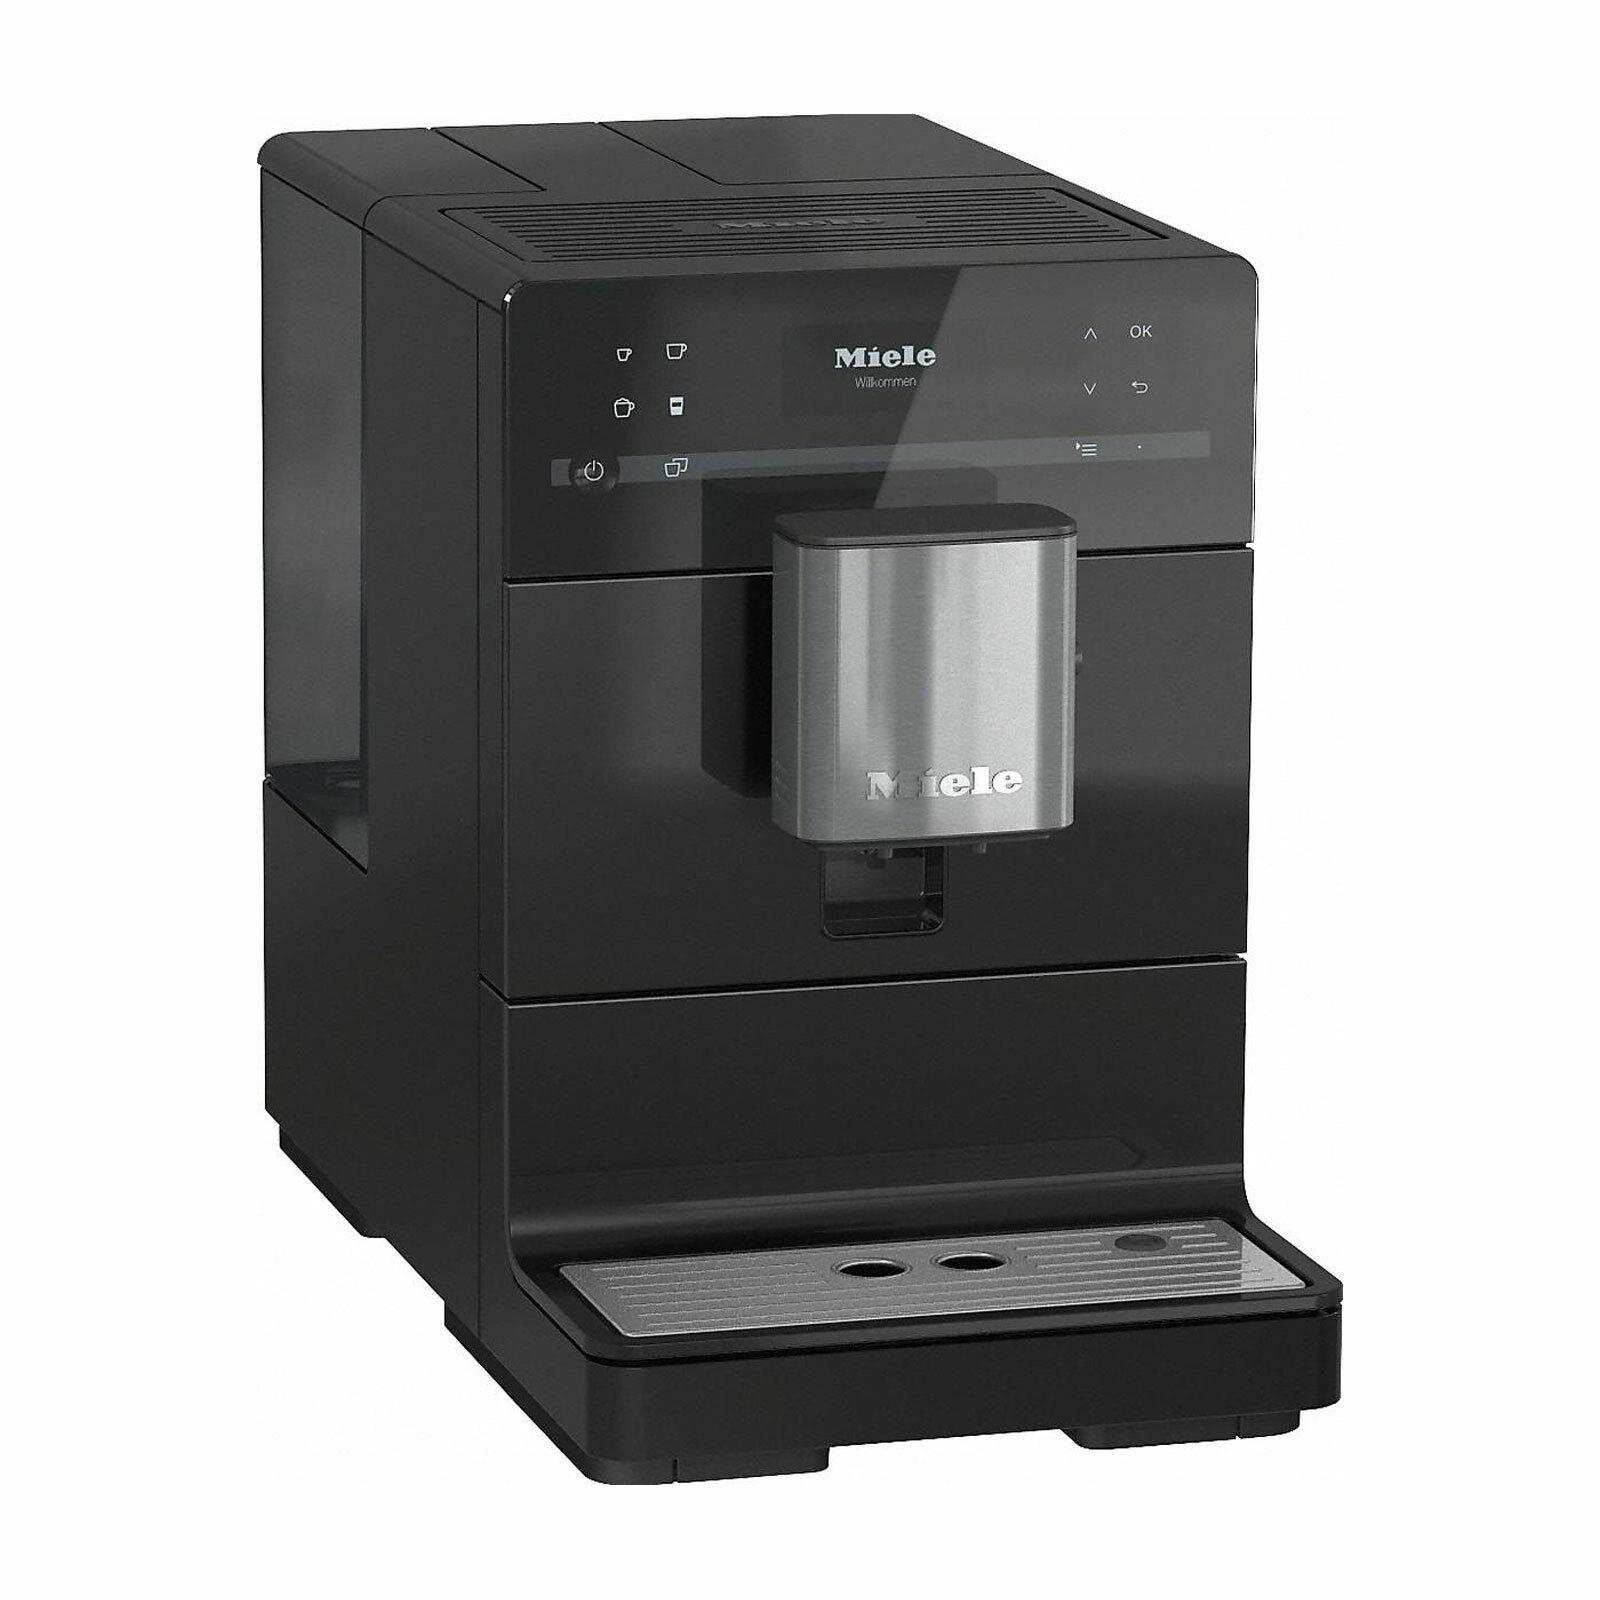 Miele CM 5310 OBSW Kaffeevollautomat Kaffeezubereitung mit Mahlwerk